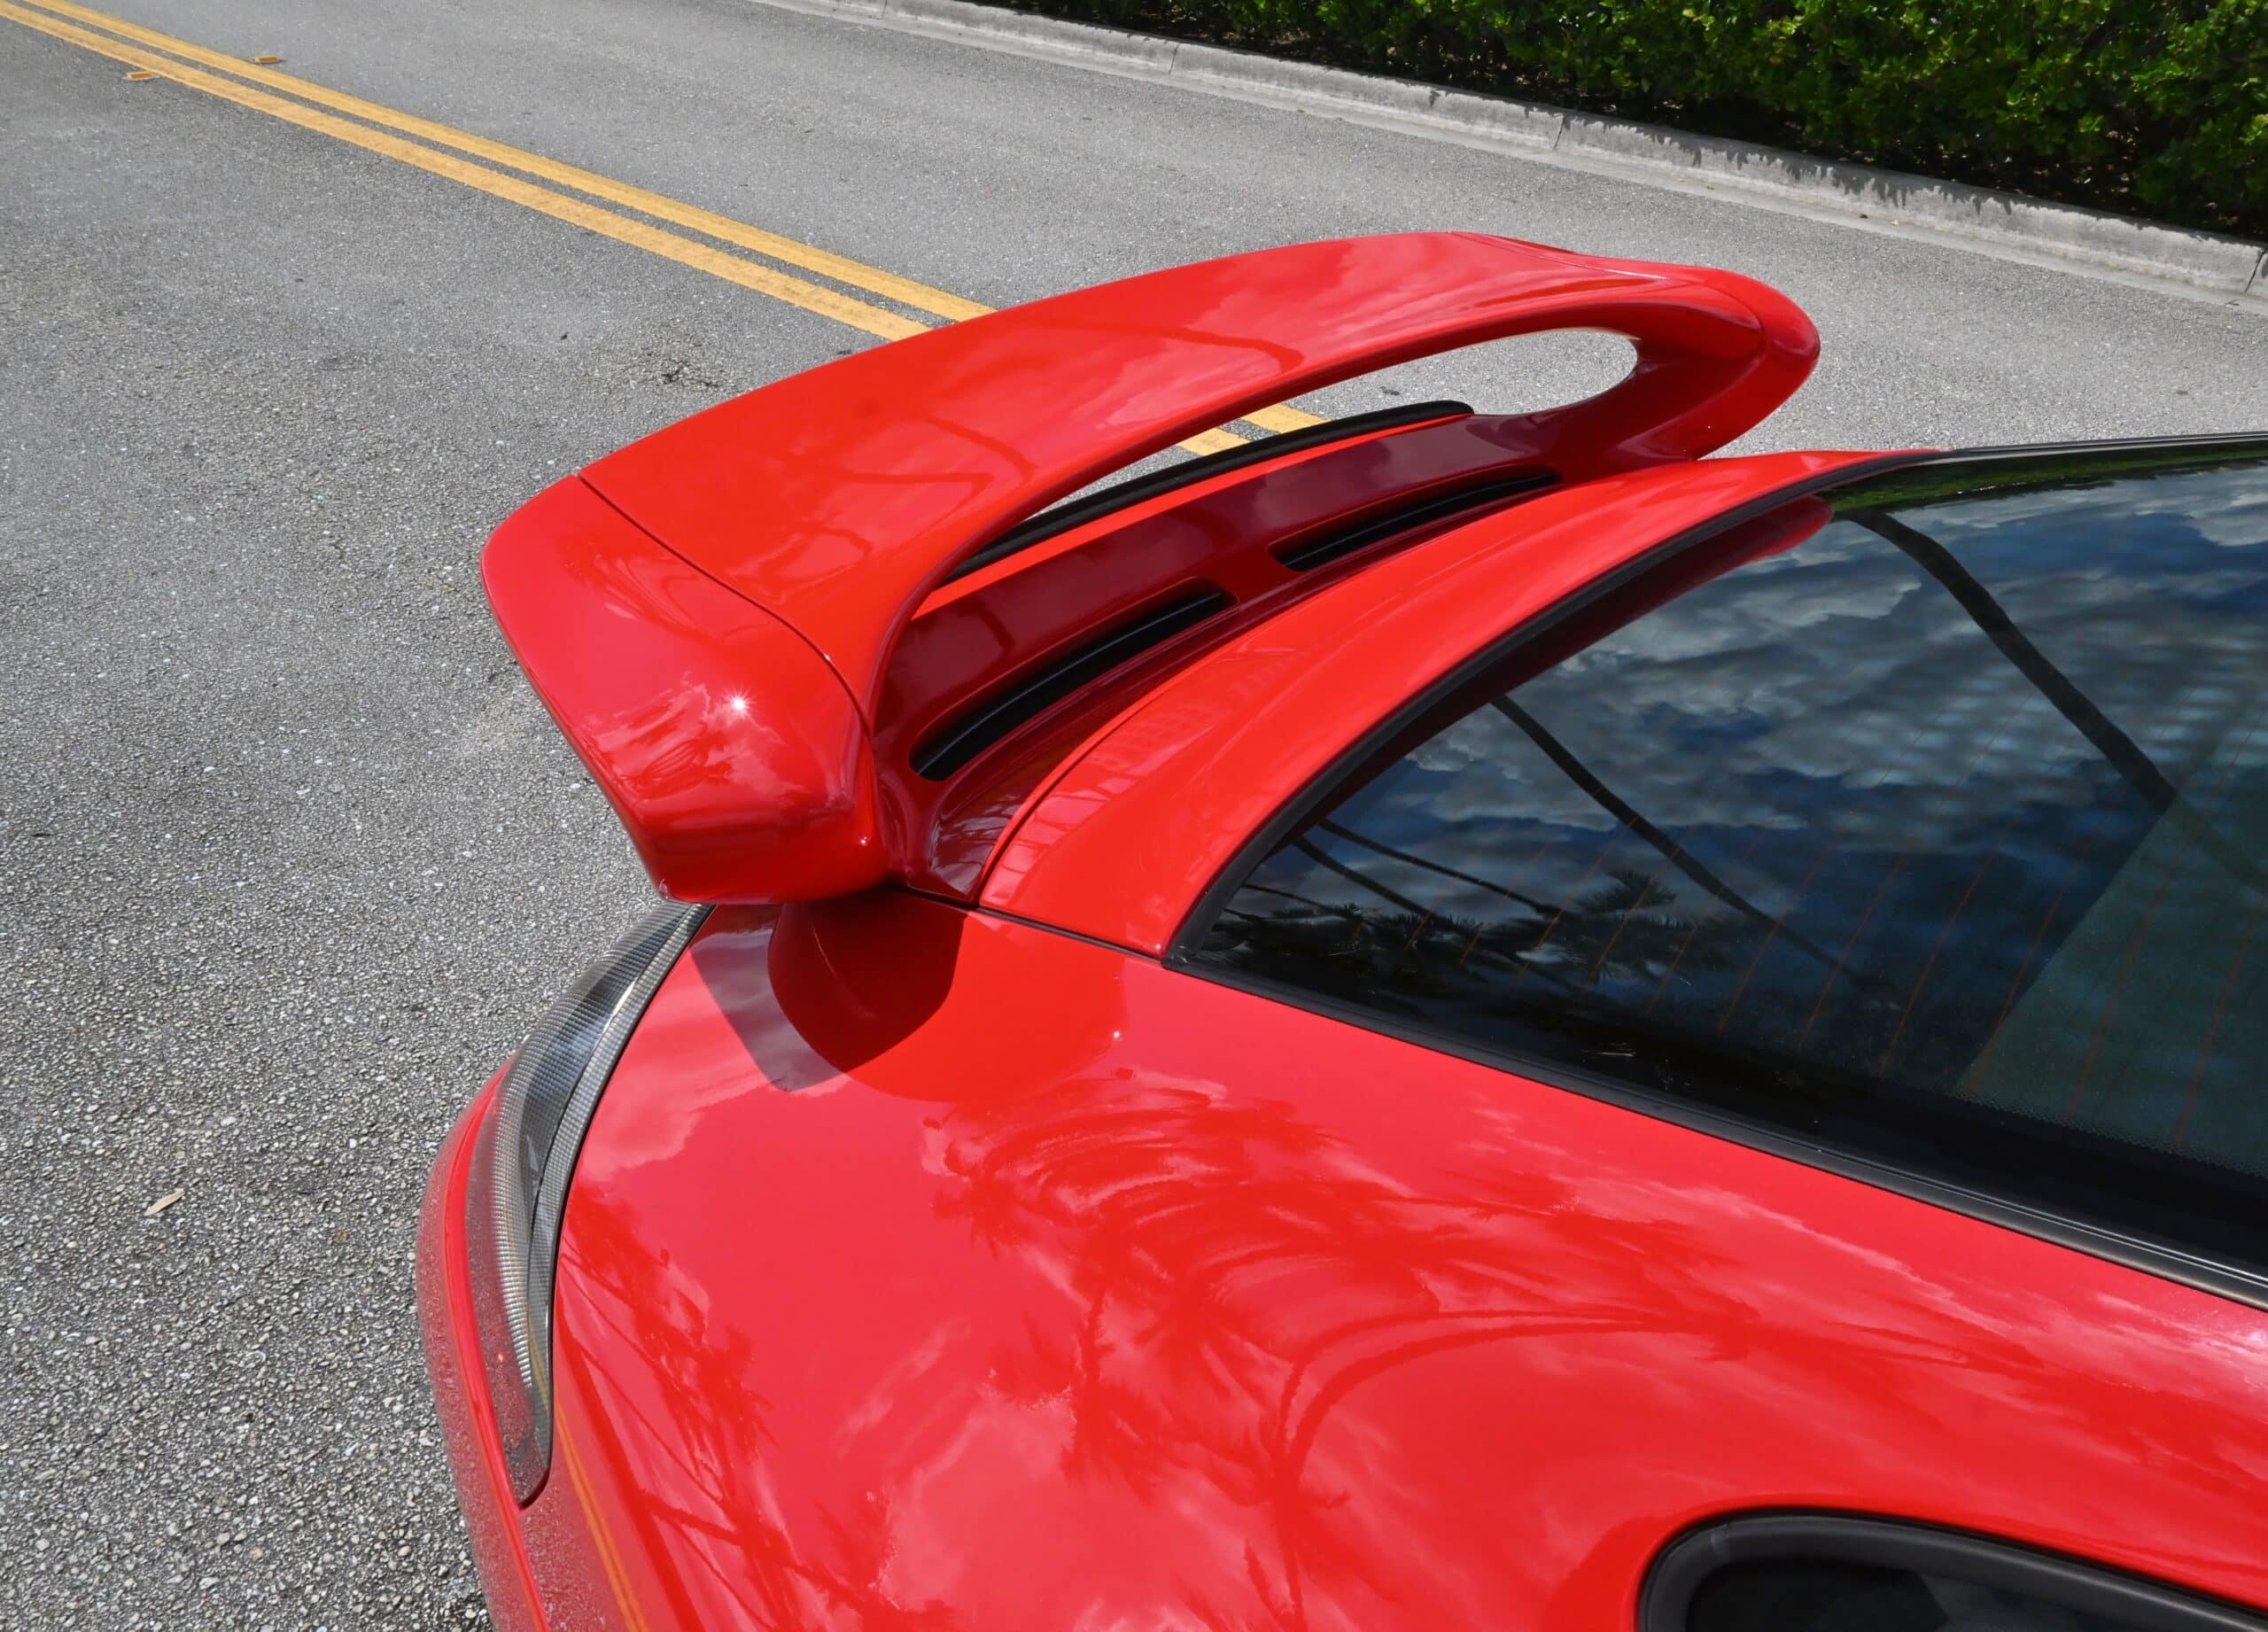 2001 Porsche 911 Carrera 2 Only 33K Miles -Aerokit – 6 Speed Manual- Tastefully modified – Service Records